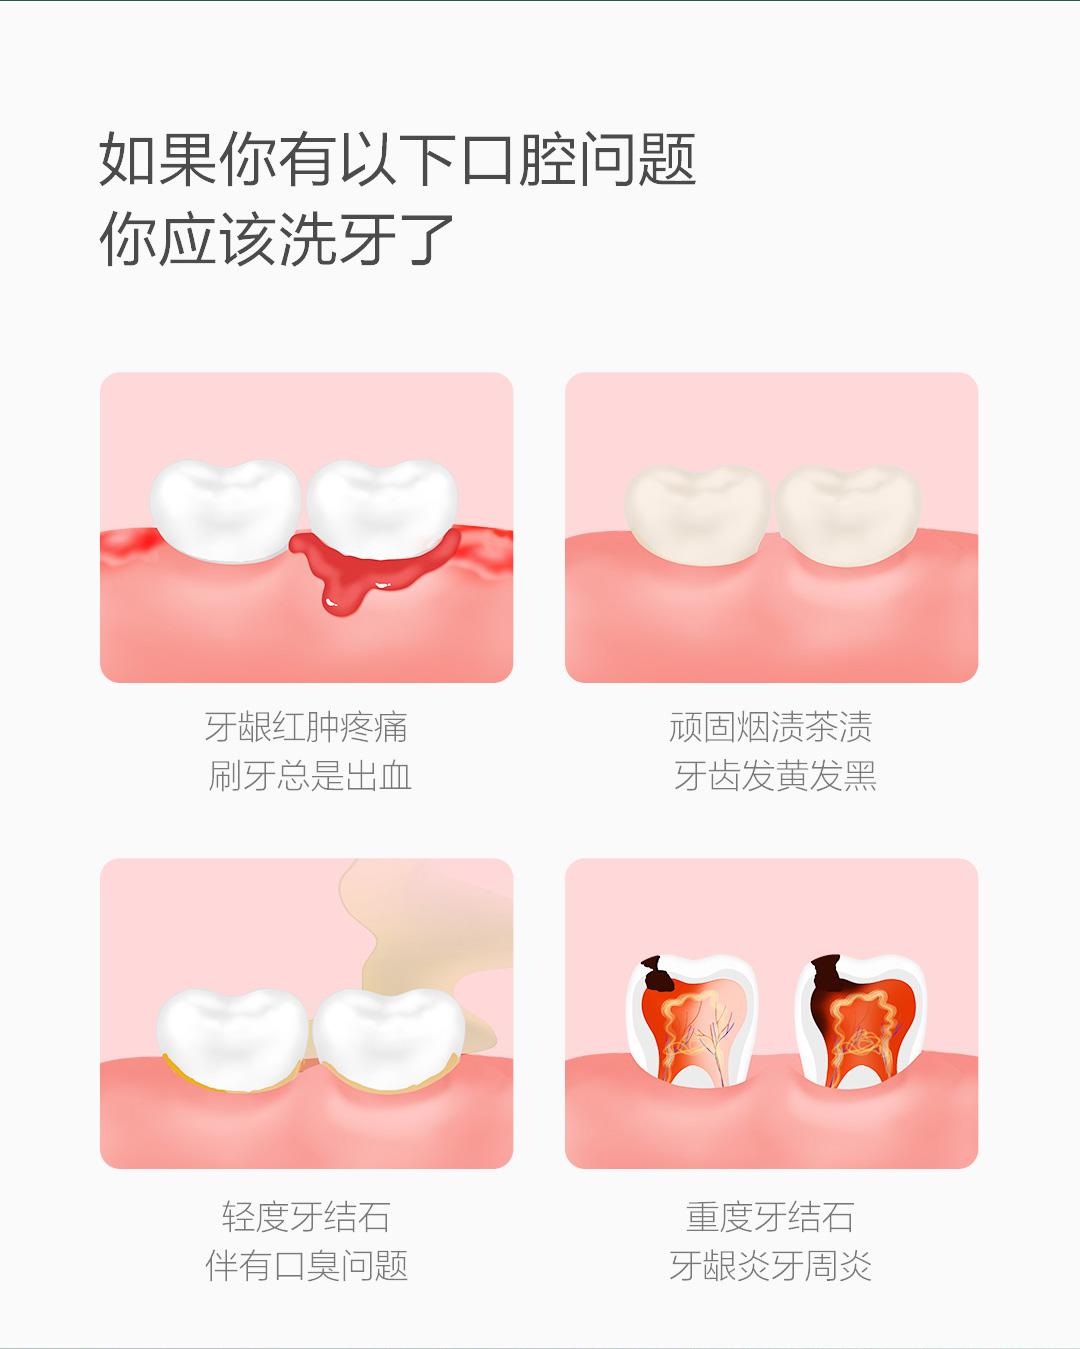 product_奇妙_贝医生超声波洁牙仪